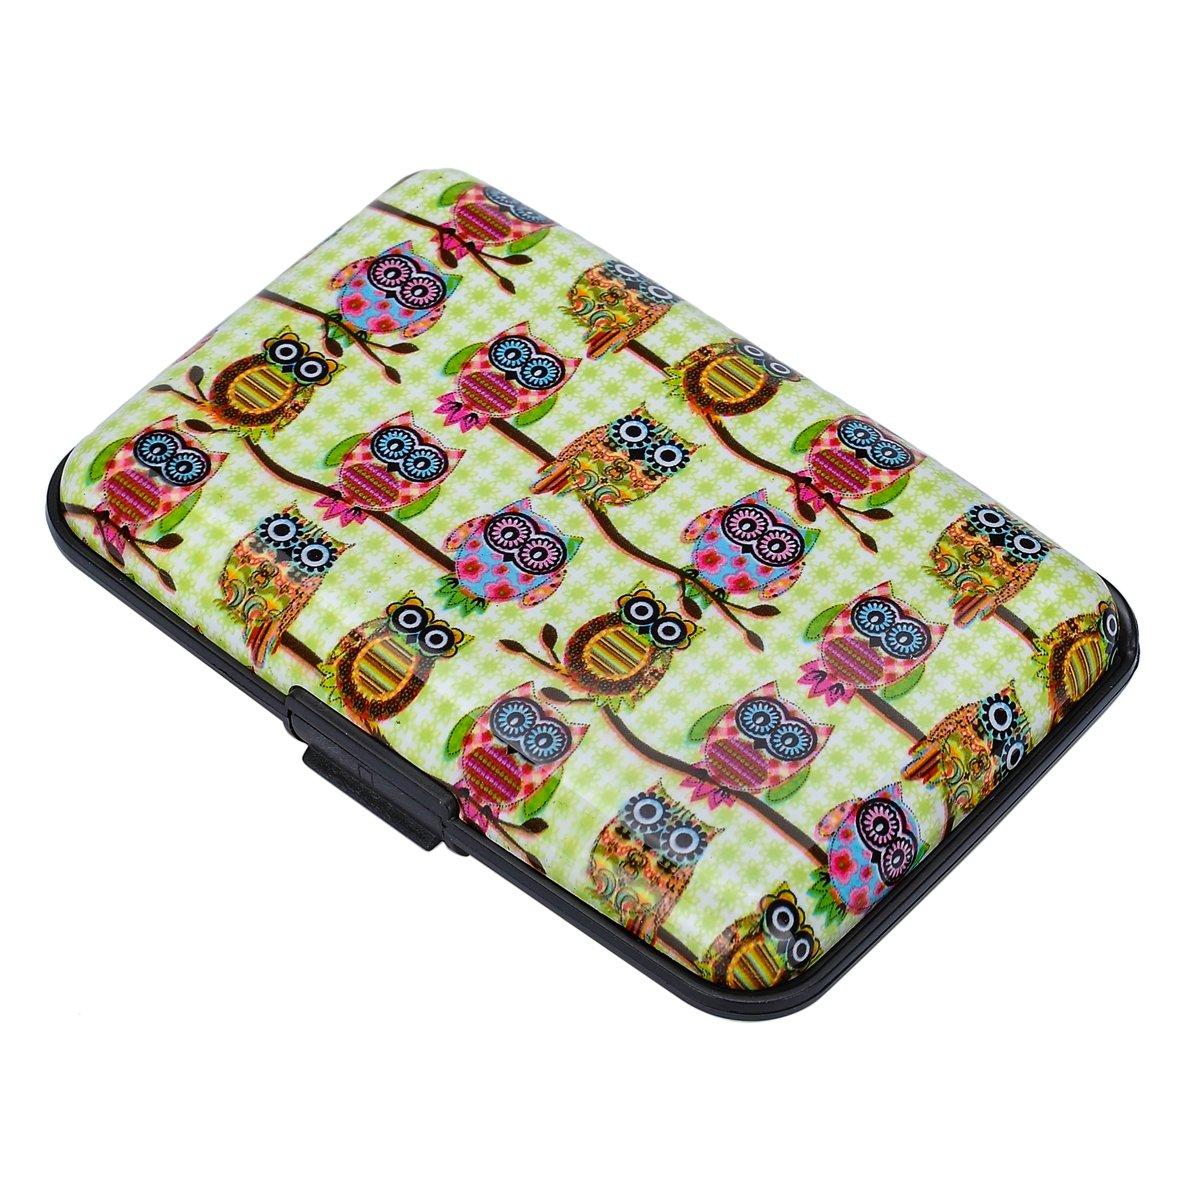 HOUSWEETY Womens Owl Pattern Long Wallet Purse Case Card Holder Coin Purse Makeup Bag HOUSWEETYG88601